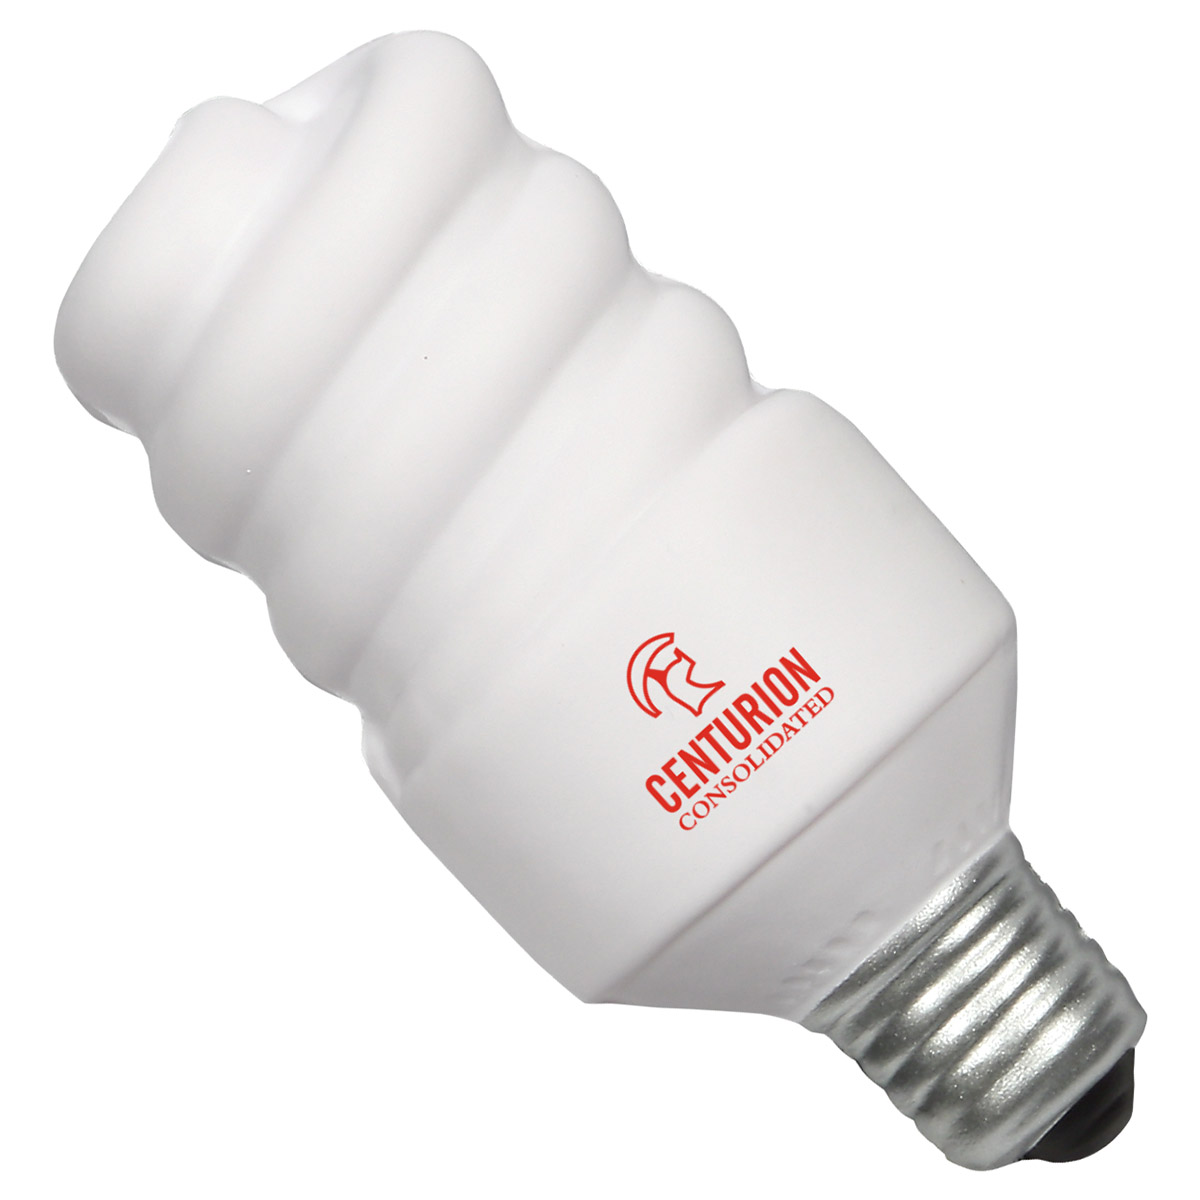 Mini Energy Saver Lightbulb Stress Reliever, LEL-ML10 - 1 Colour Imprint